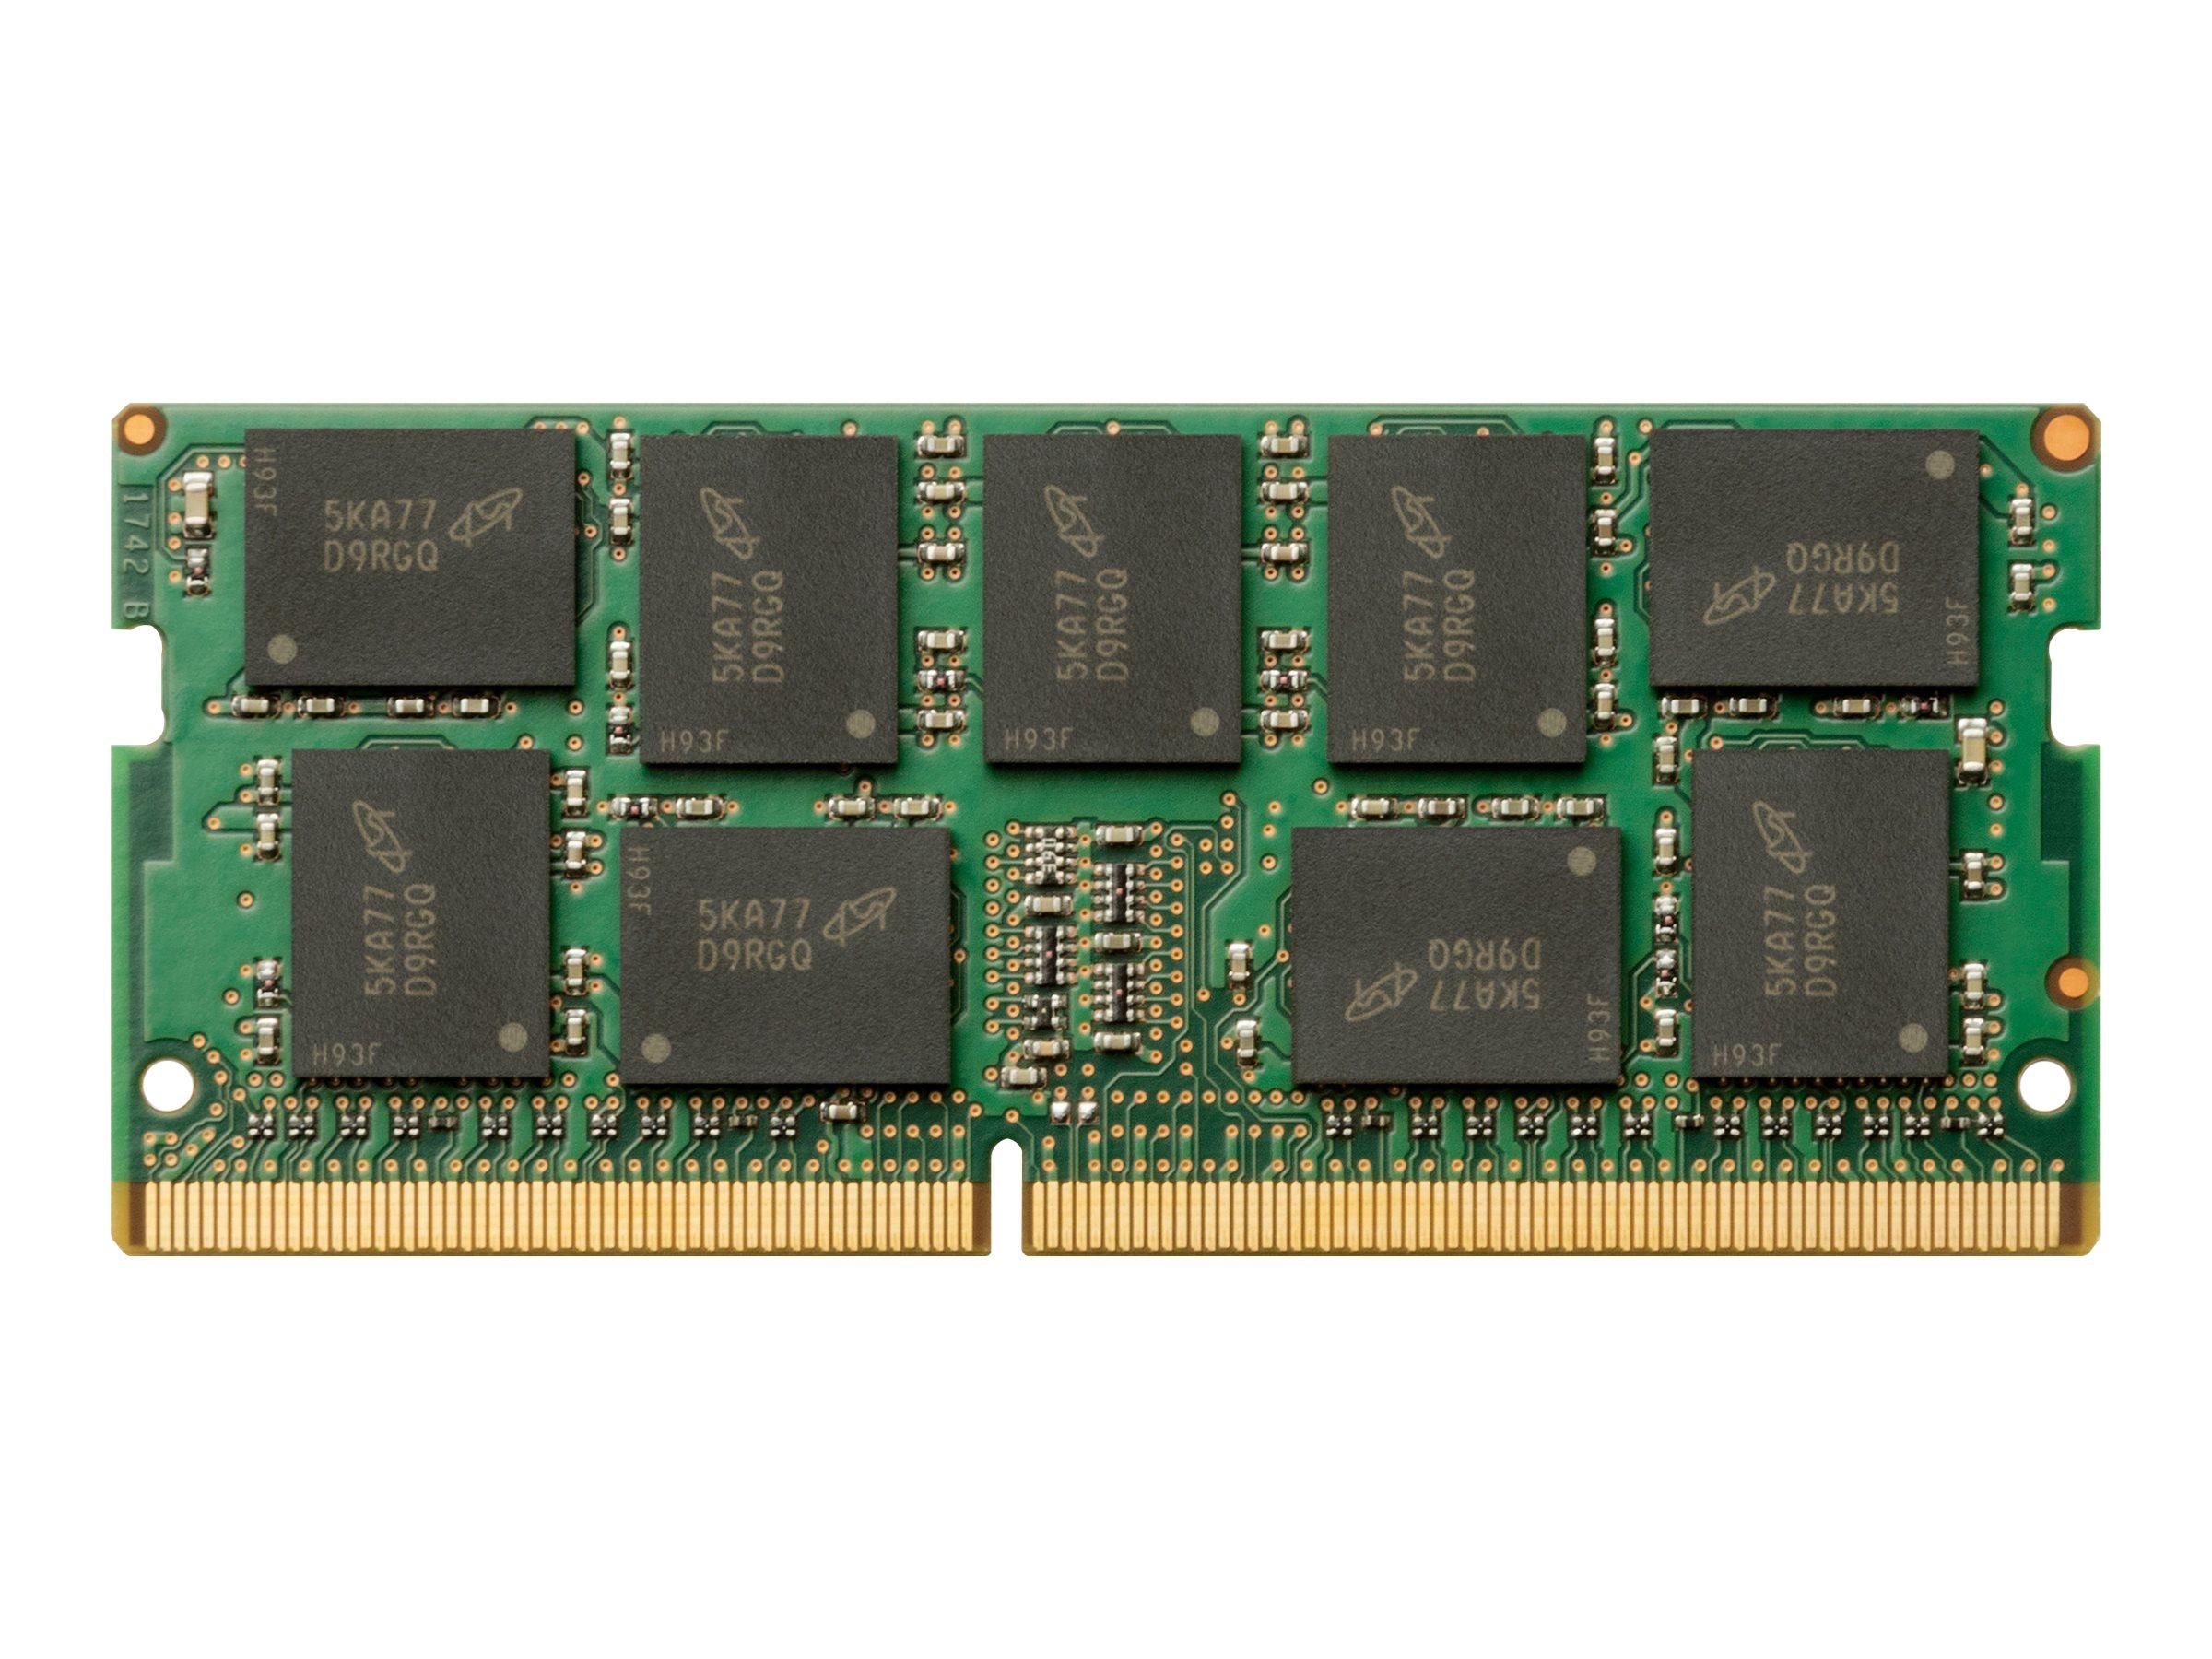 Hp ddr4 16 gb dimm 288 pin 2666 mhz pc4 21300 1 2 v 8453363 1xd85aa